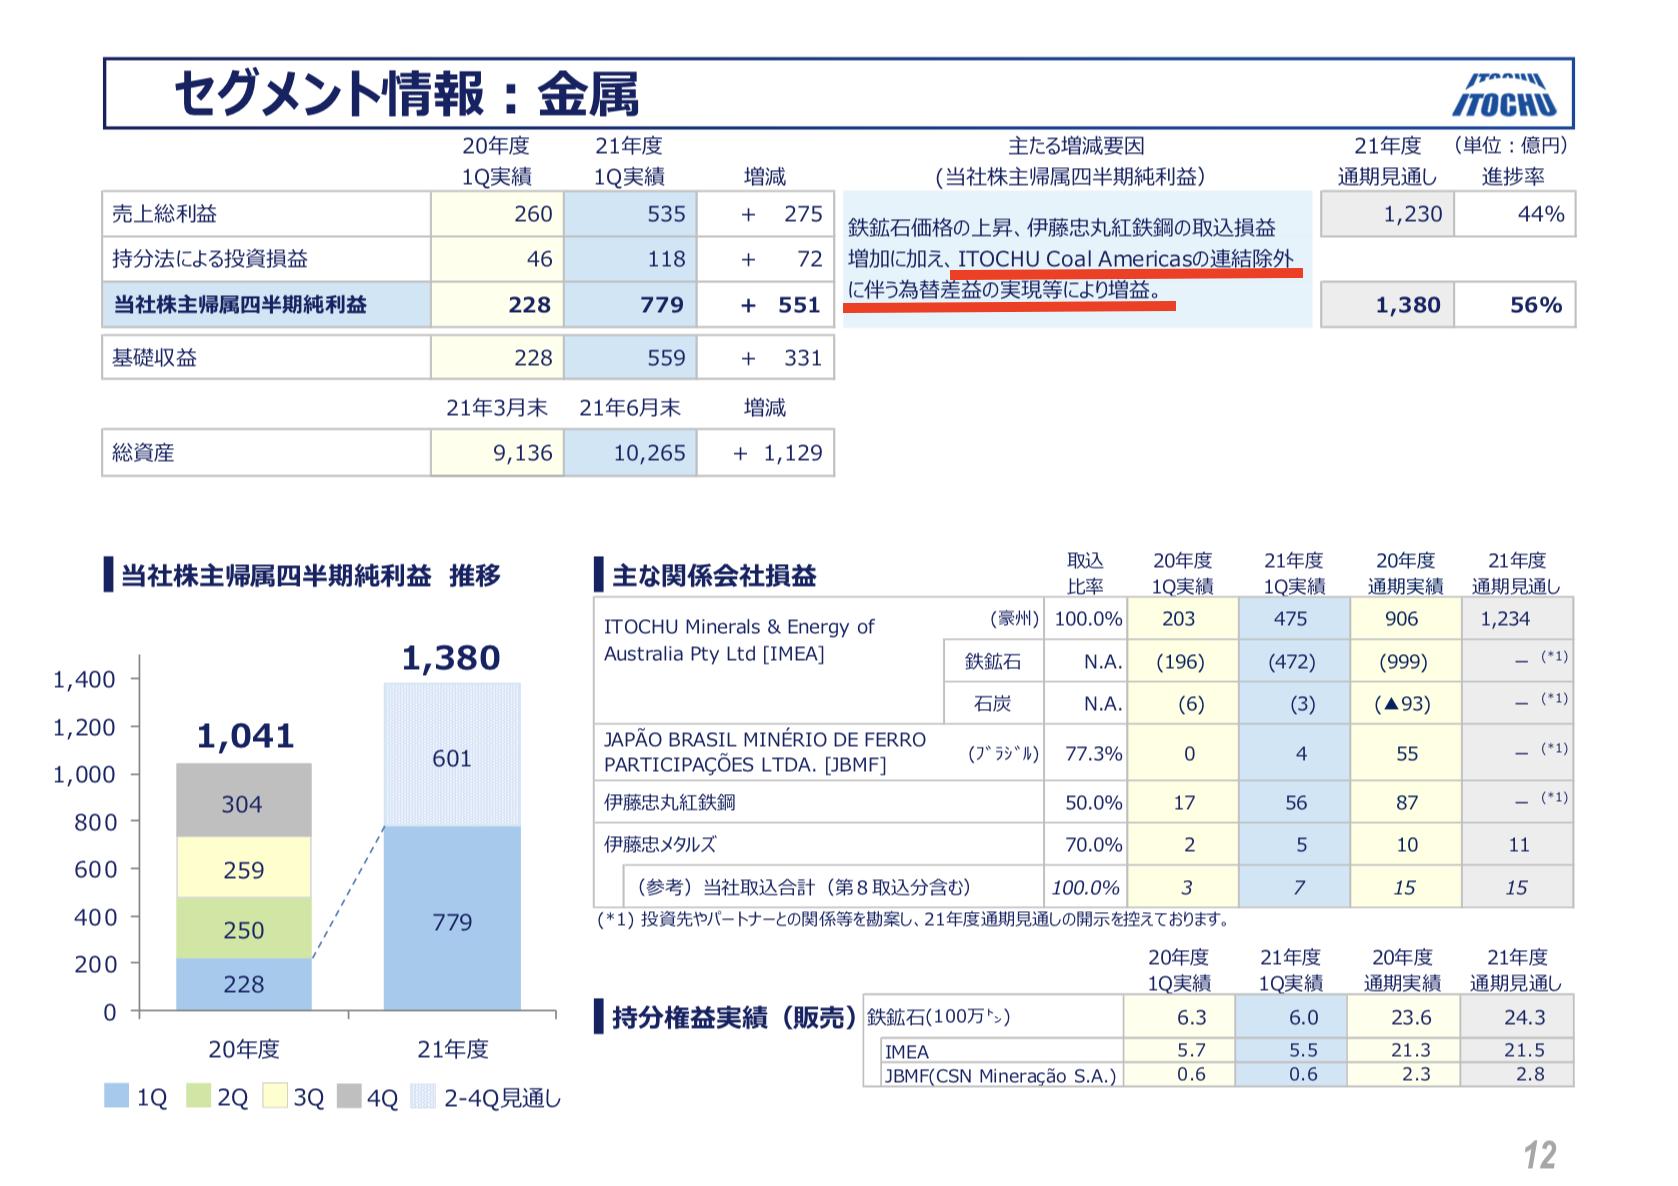 伊藤忠商事 2021年度1Q決算を徹底解説! さとり世代の株日記 資産運用 株 投資 資産形成